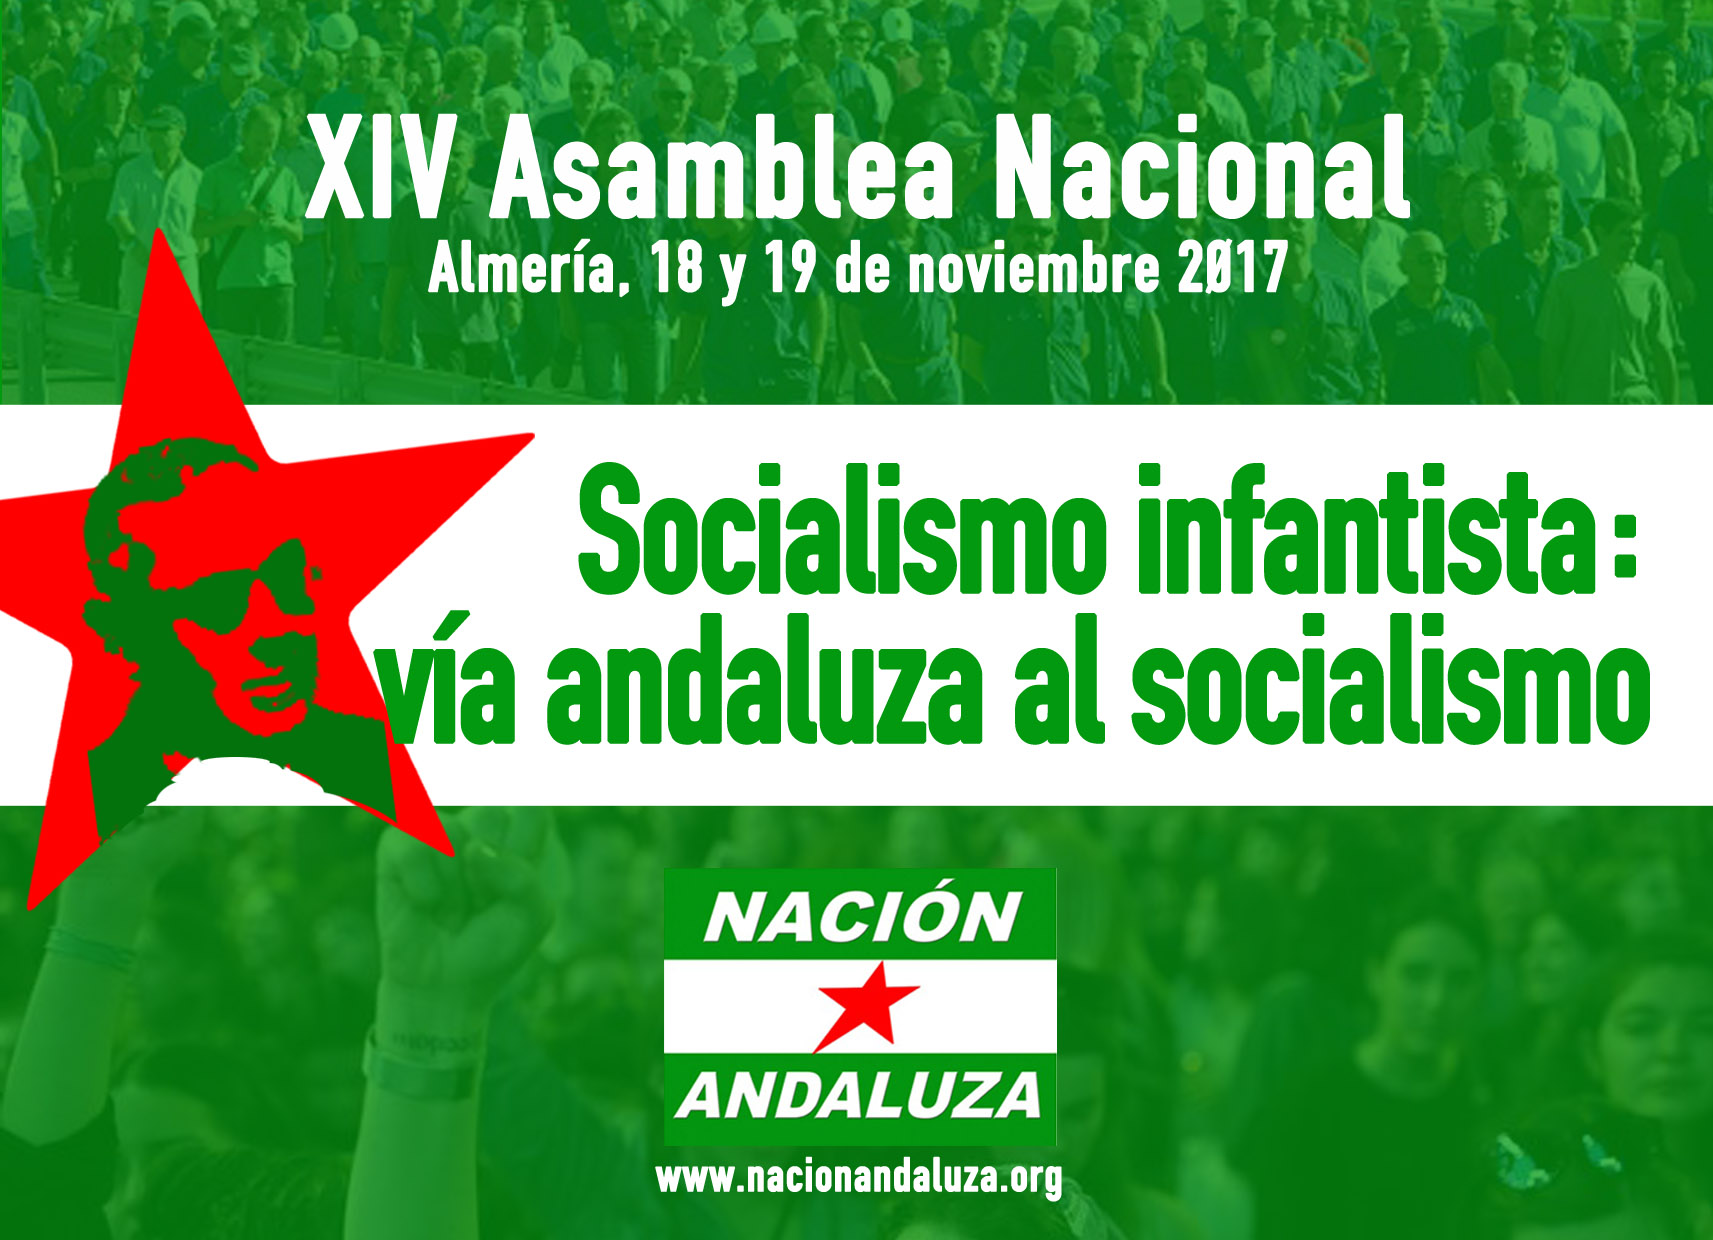 "Hacia la XIV Asamblea Nacional: ""Socialismo infantista: vía andaluza al socialismo"""